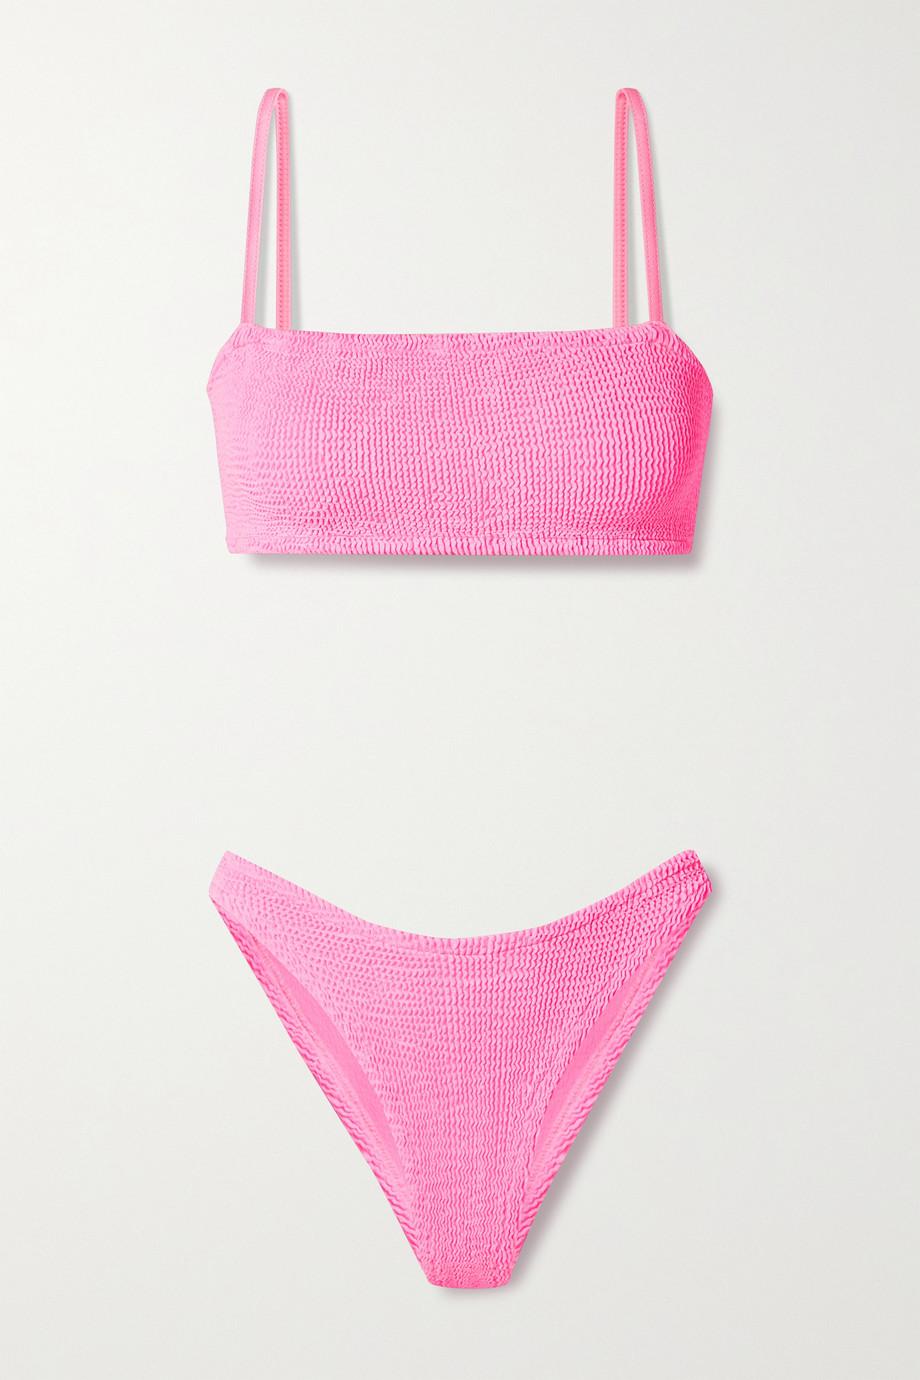 Hunza G + NET SUSTAIN Gigi seersucker bikini